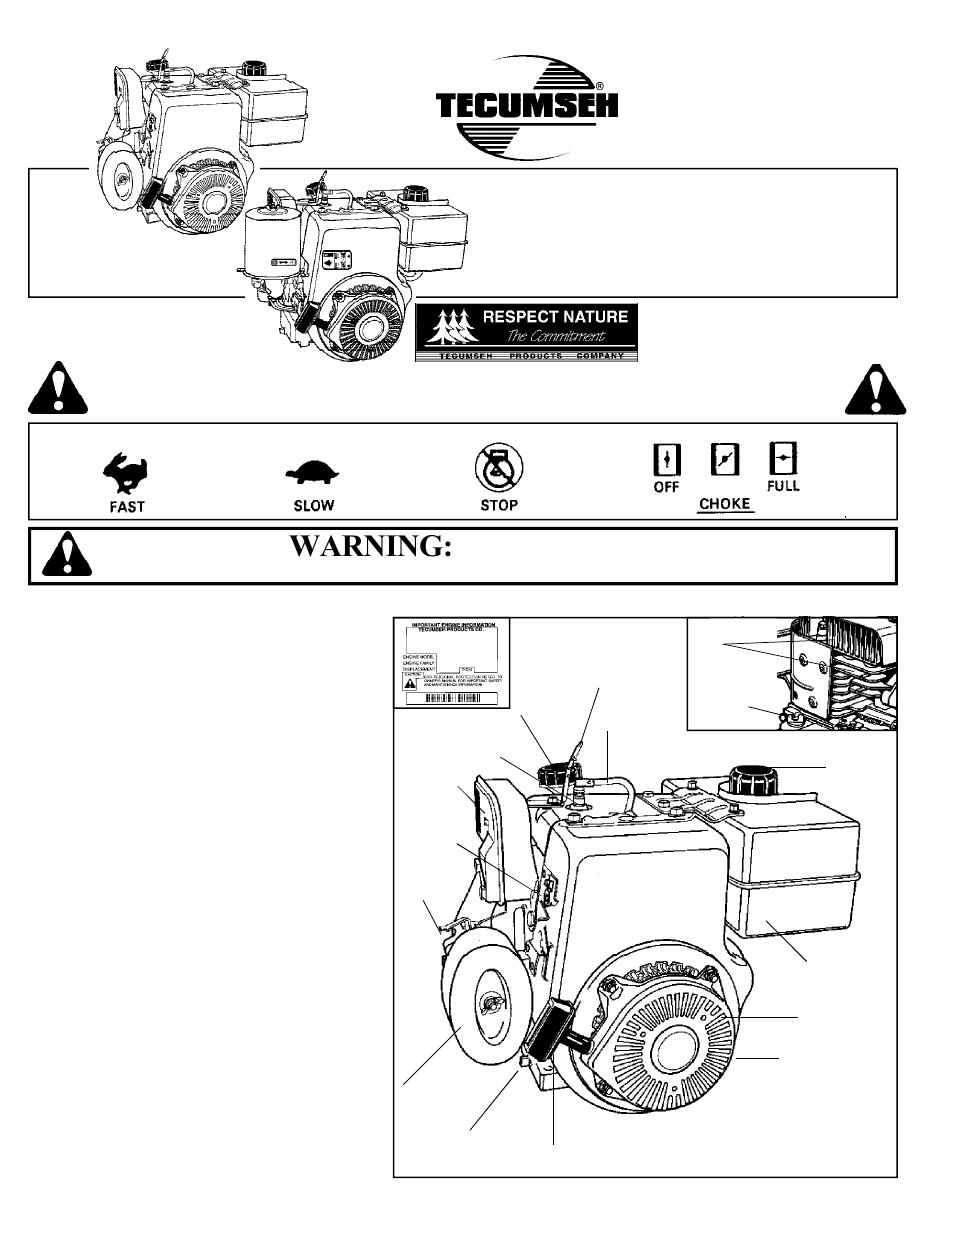 Tecumseh Hh100 Ignition Wiring Diagram